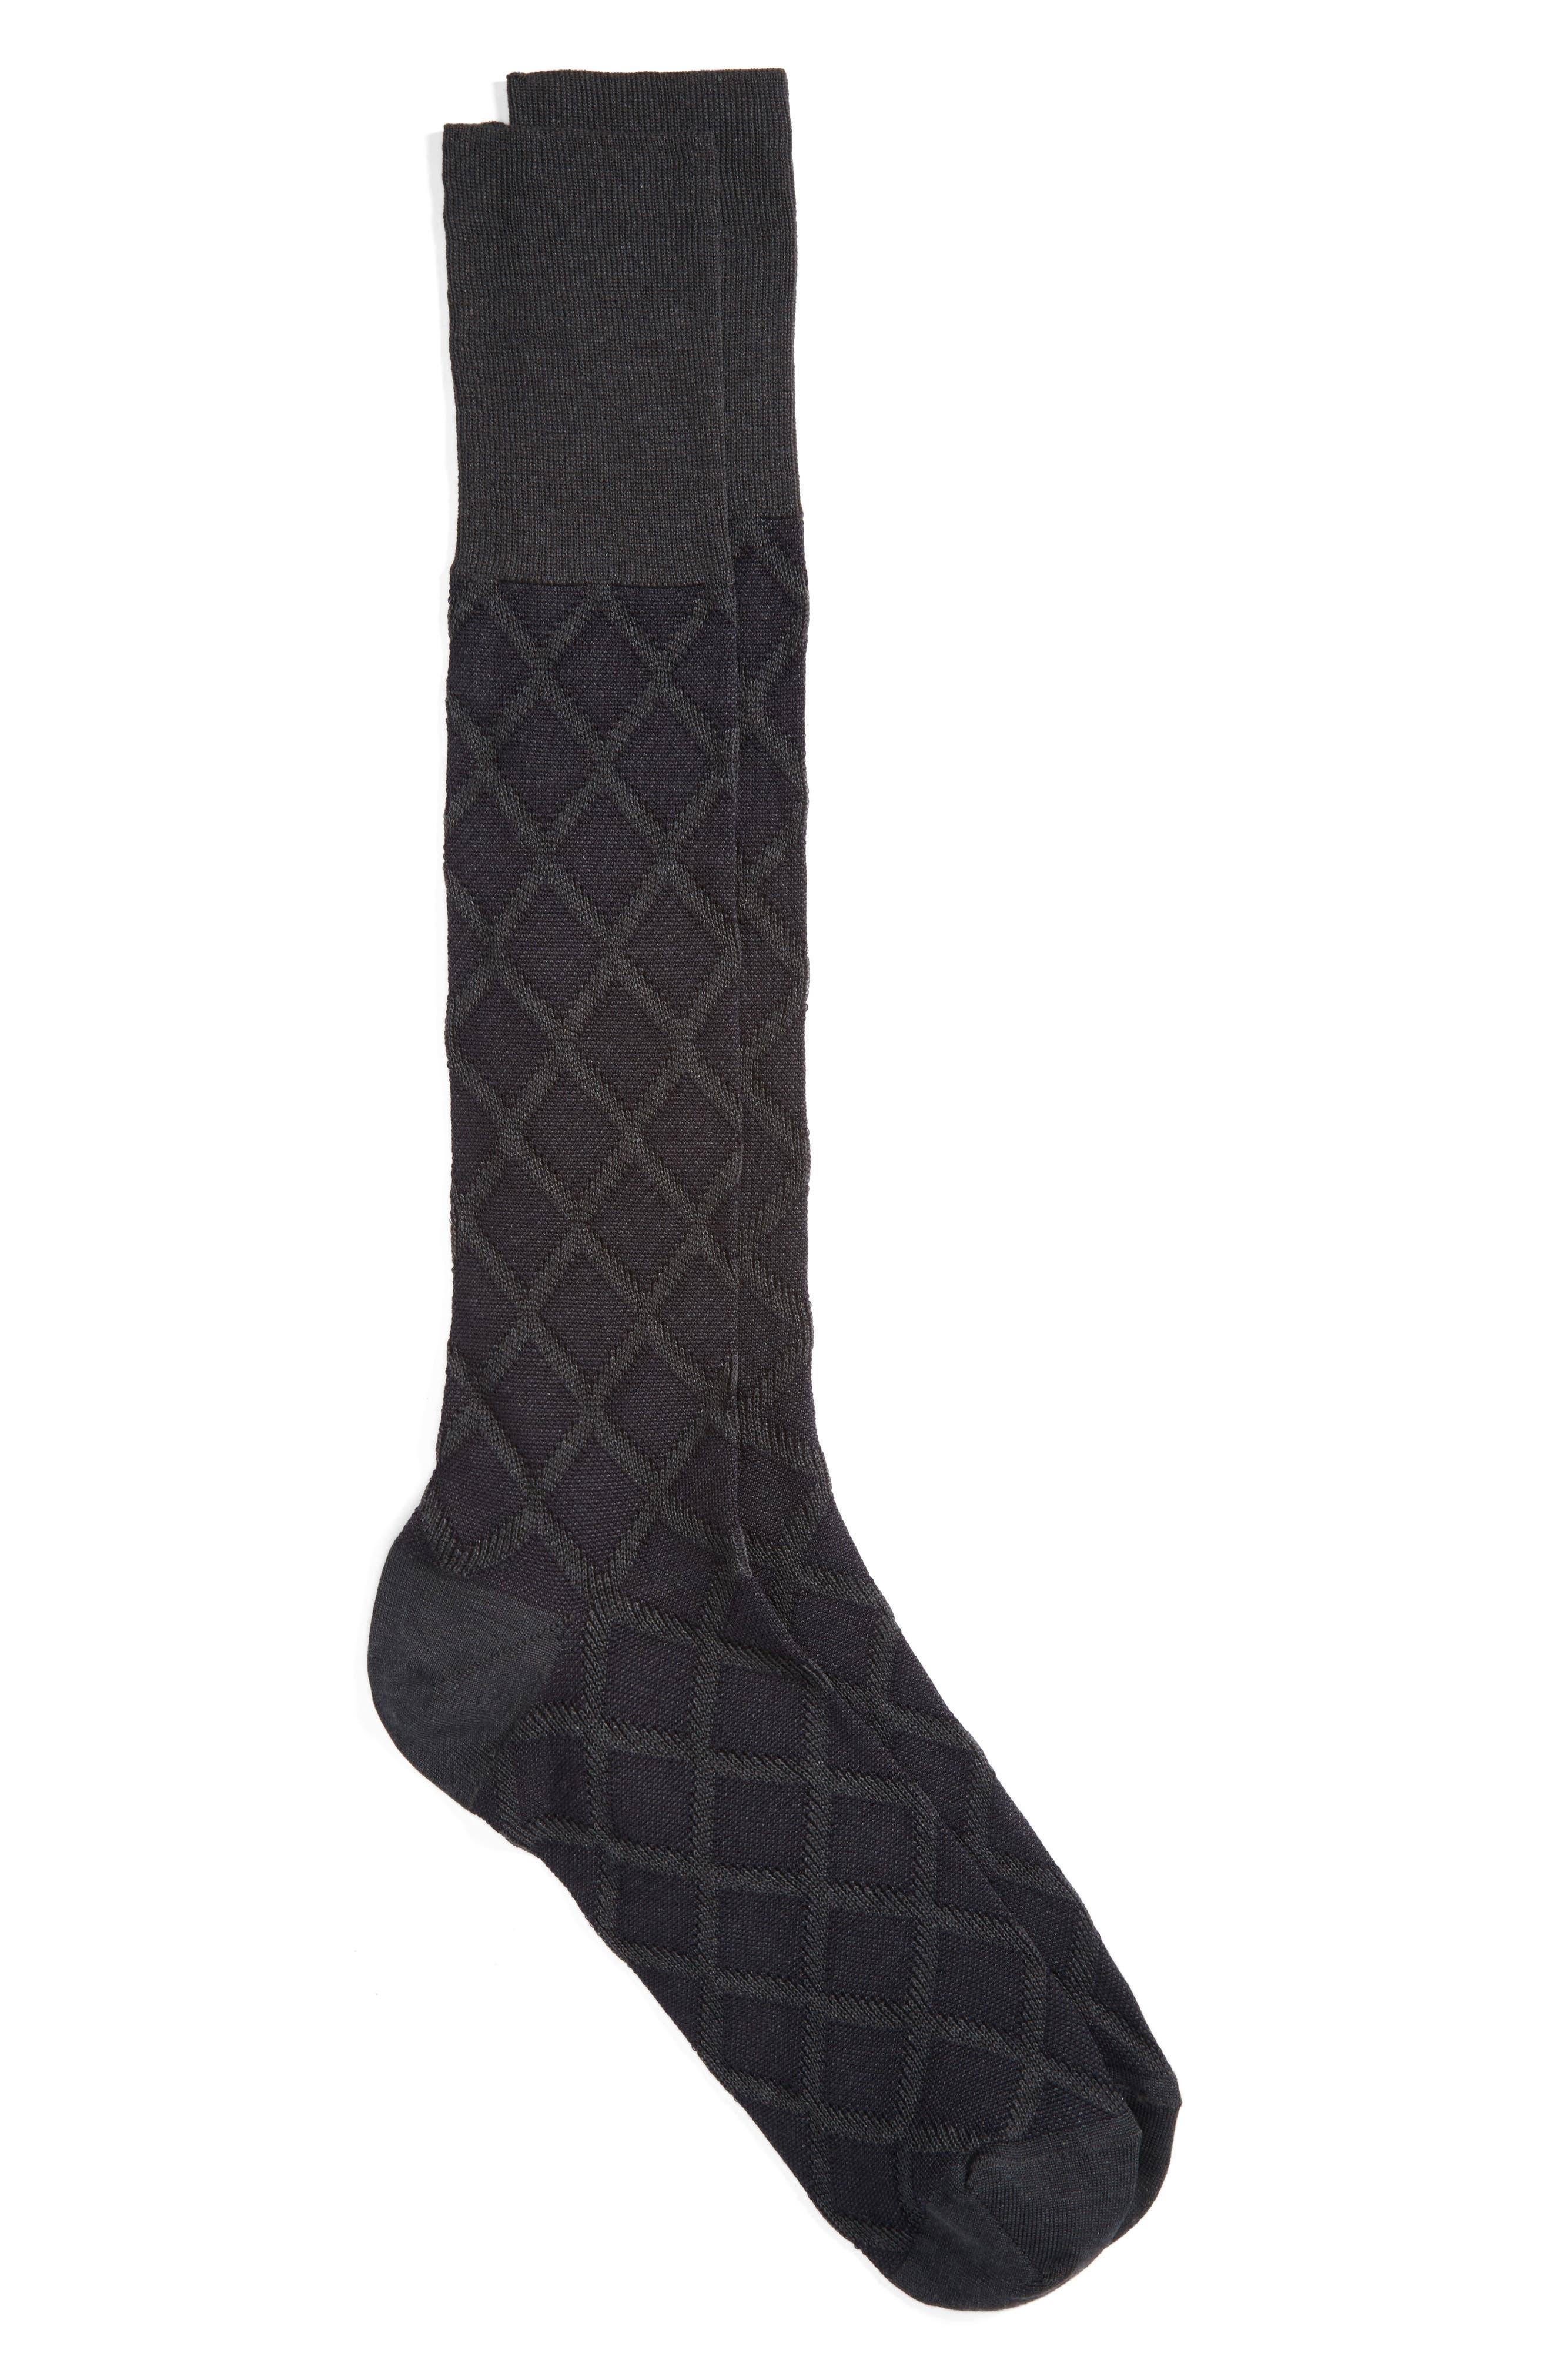 Main Image - John W. Nordstrom® Over the Calf Diamond Socks